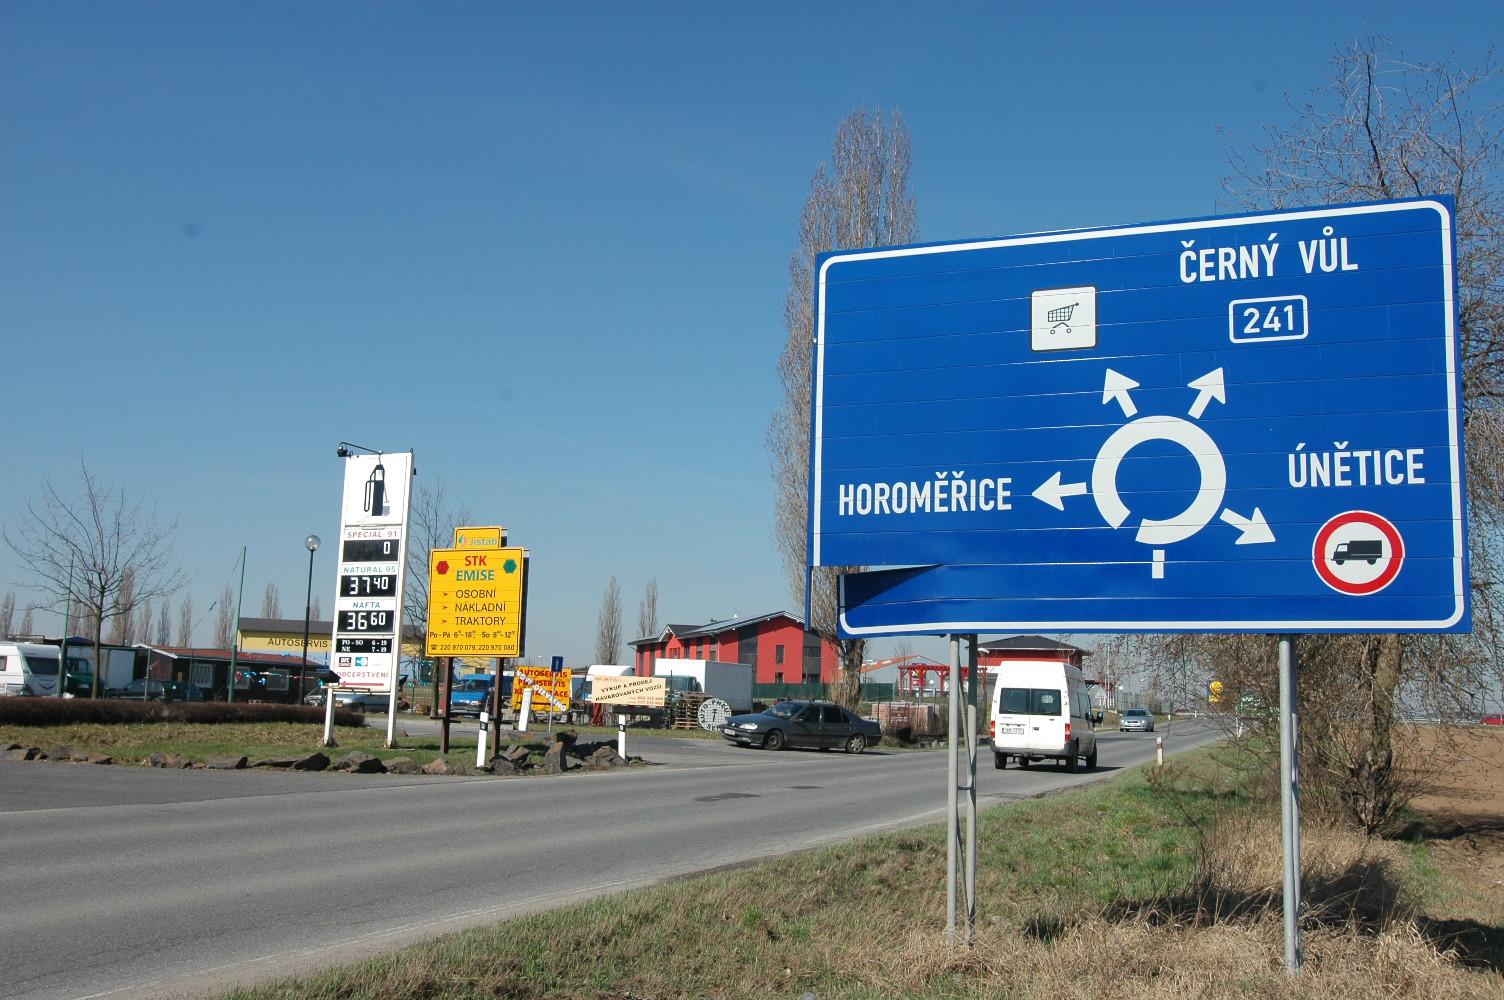 Jistab, a.s. - STK Horoměřice